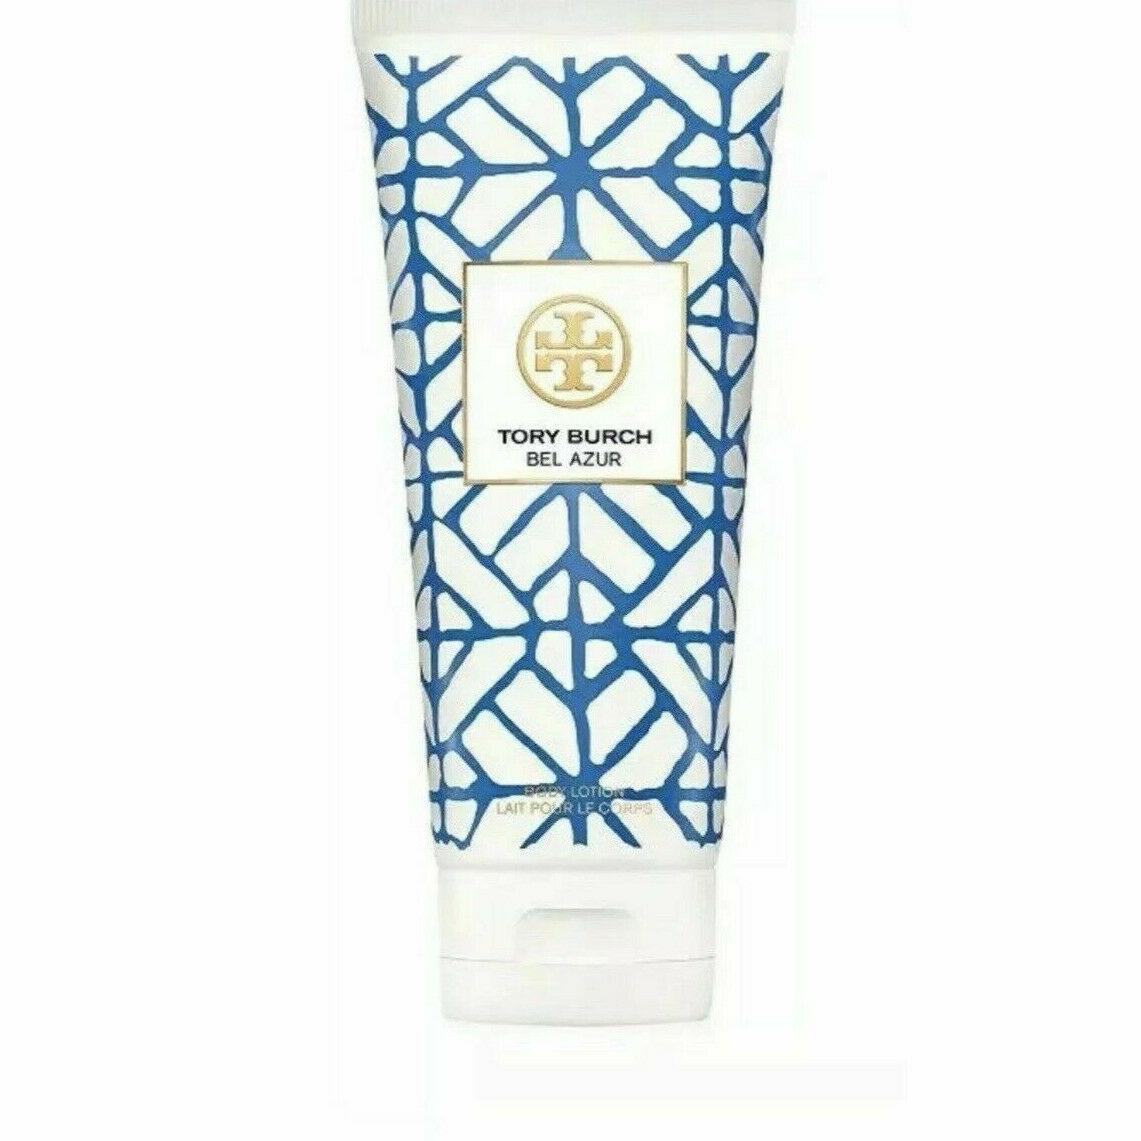 Tory Burch BEL AZUR Perfume BODY LOTION Women BLUE 6.7oz 200ml Fresh NeW  - $28.50